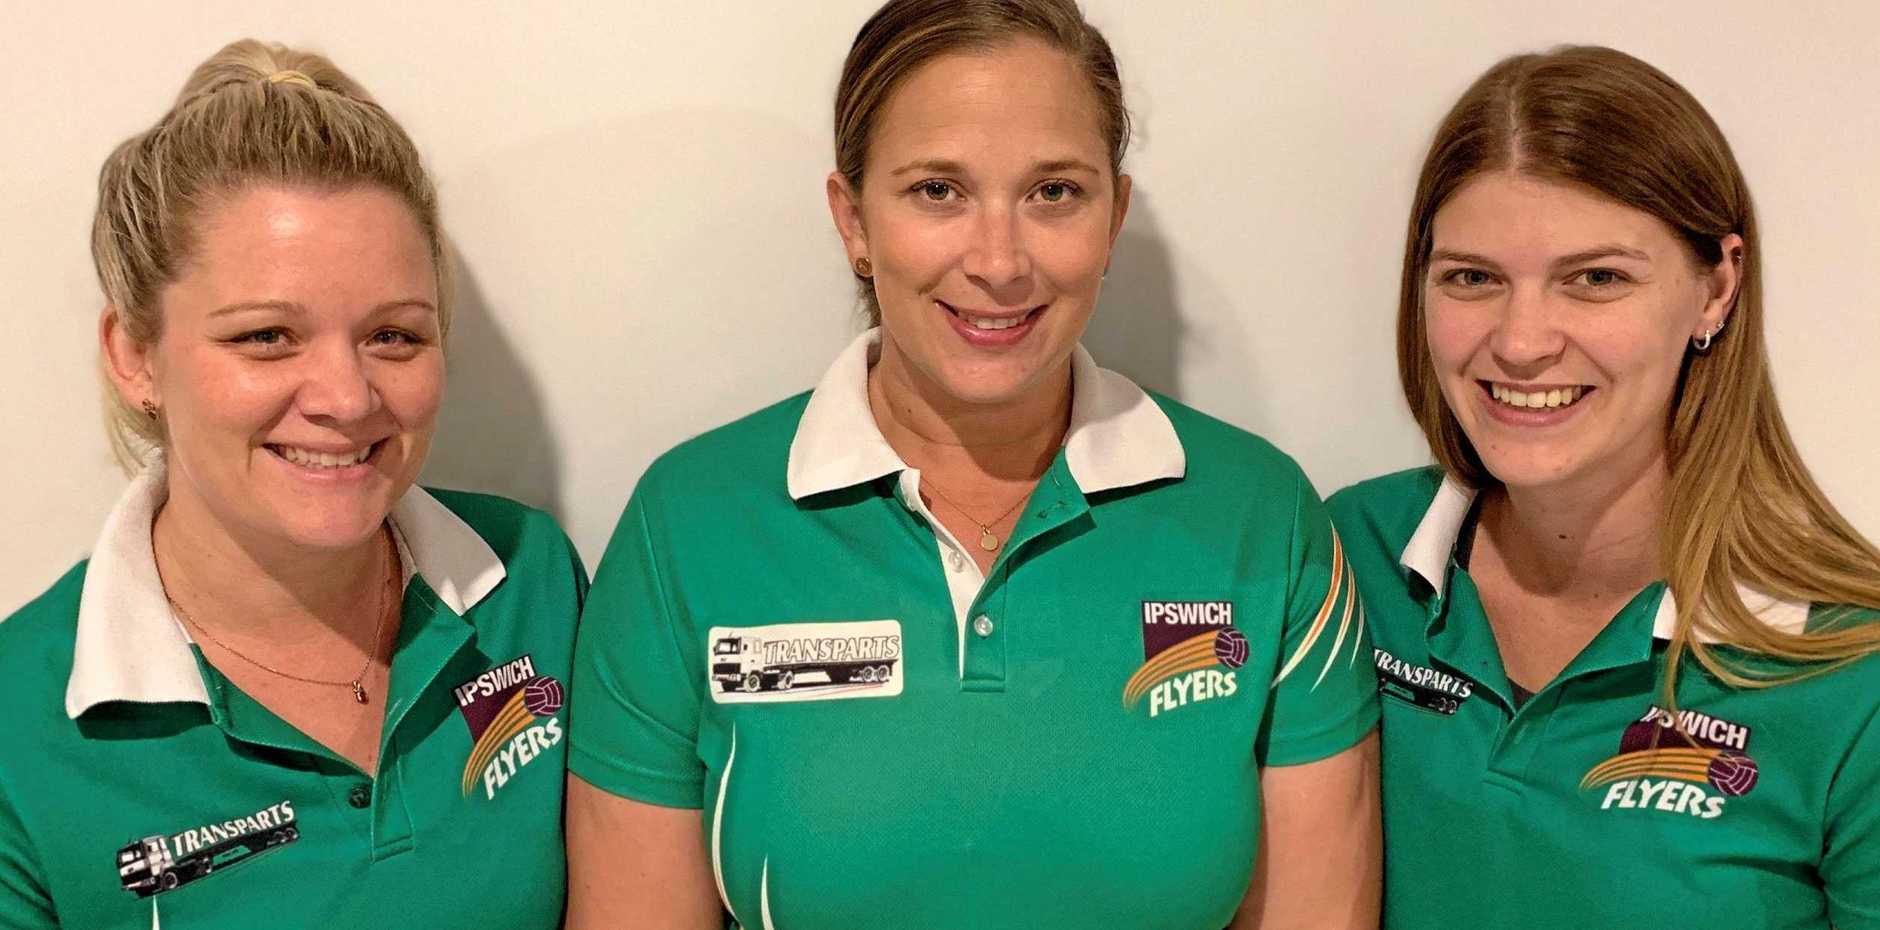 EXPERIENCED TRIO: Ipswich Flyers leadership team (from left) Emilie McInally, Melissa Beutel and Tara Bramwell.